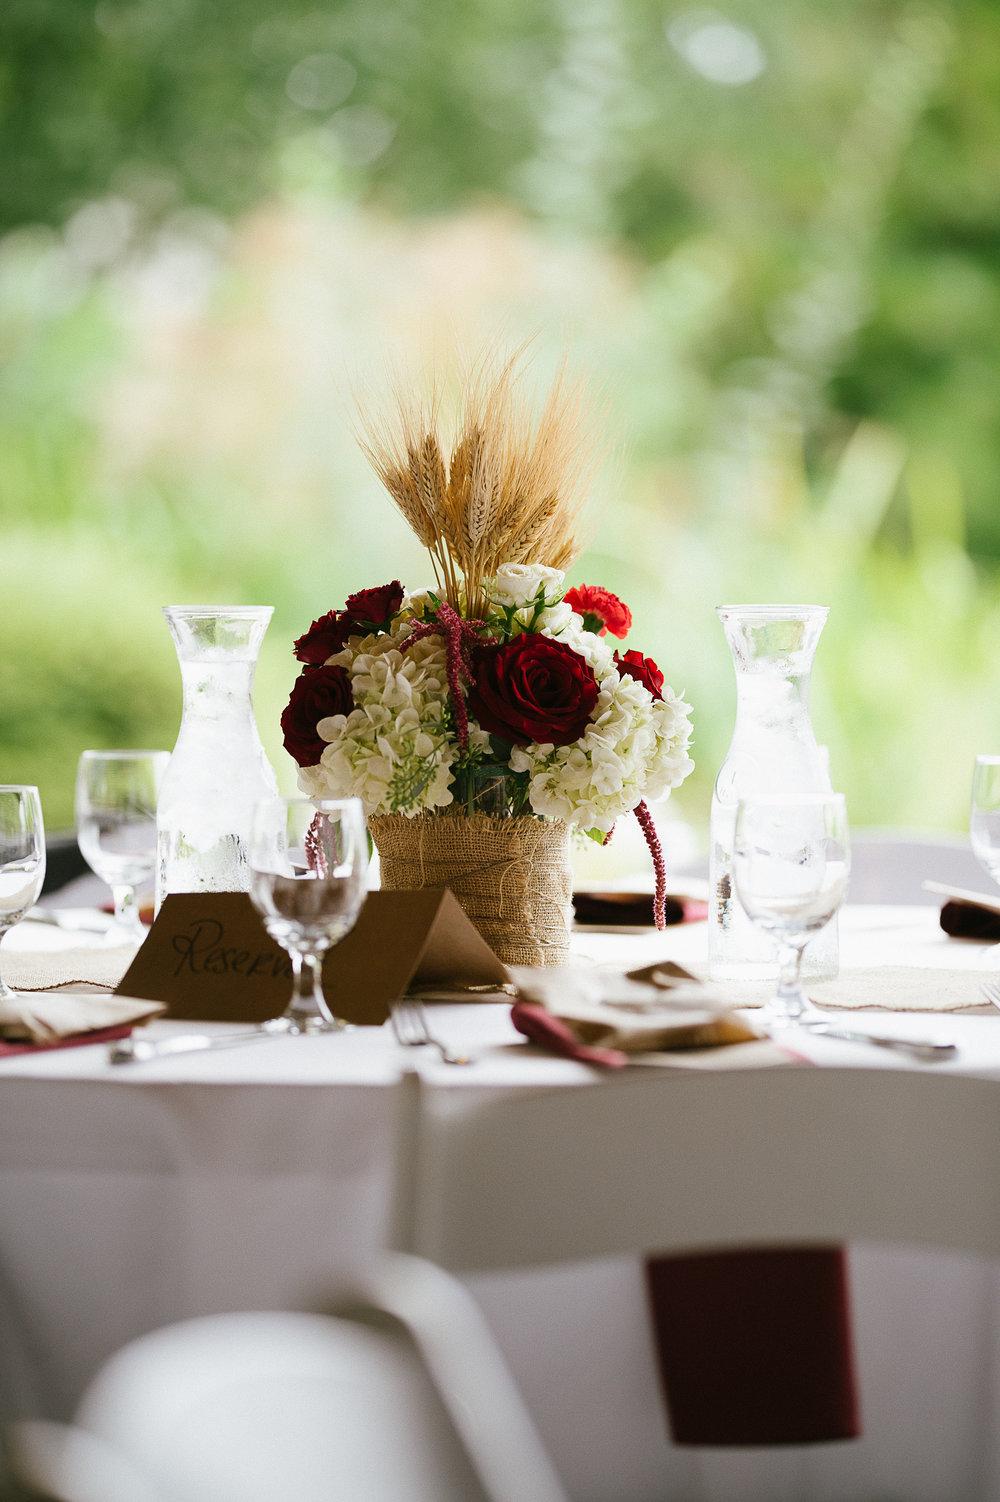 Swan Trail Farm Wedding_Sarah Schurman + Brian Skadan_Snohomish Wedding_Kelsey Lane Photography-5940.jpg